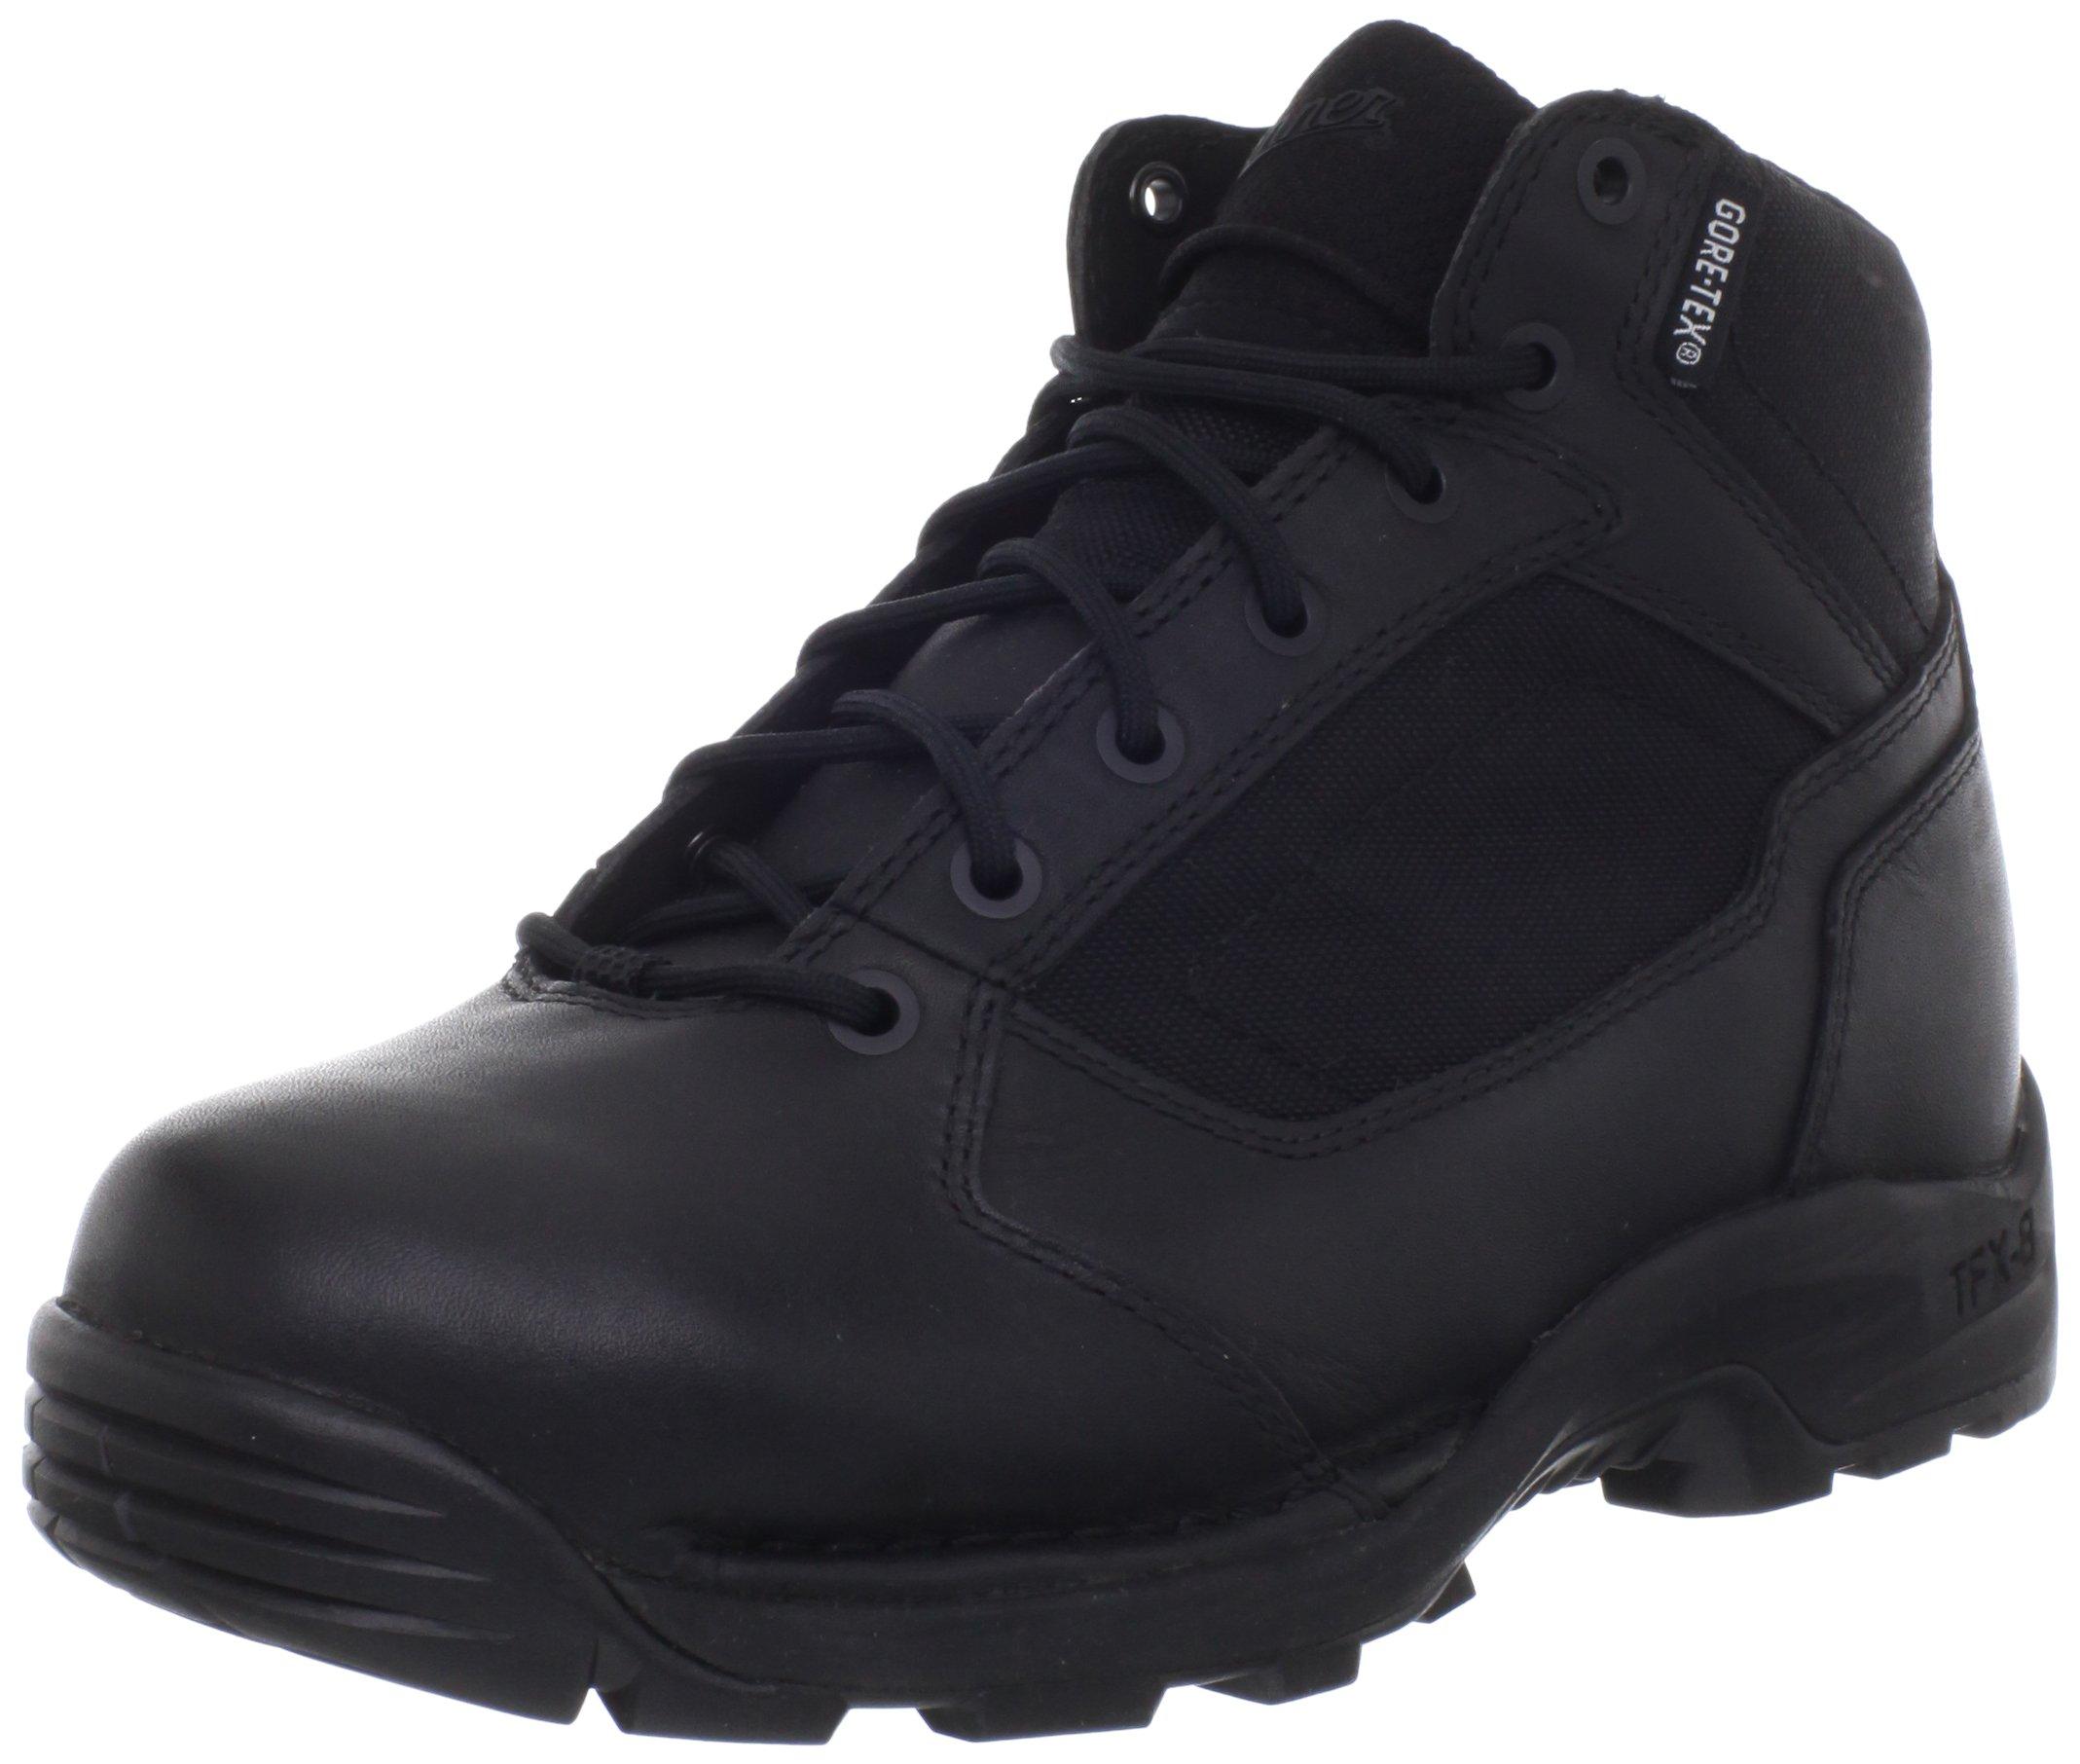 Danner Women's Striker Torrent 45 Work Boot,Black,6.5 M US by Danner